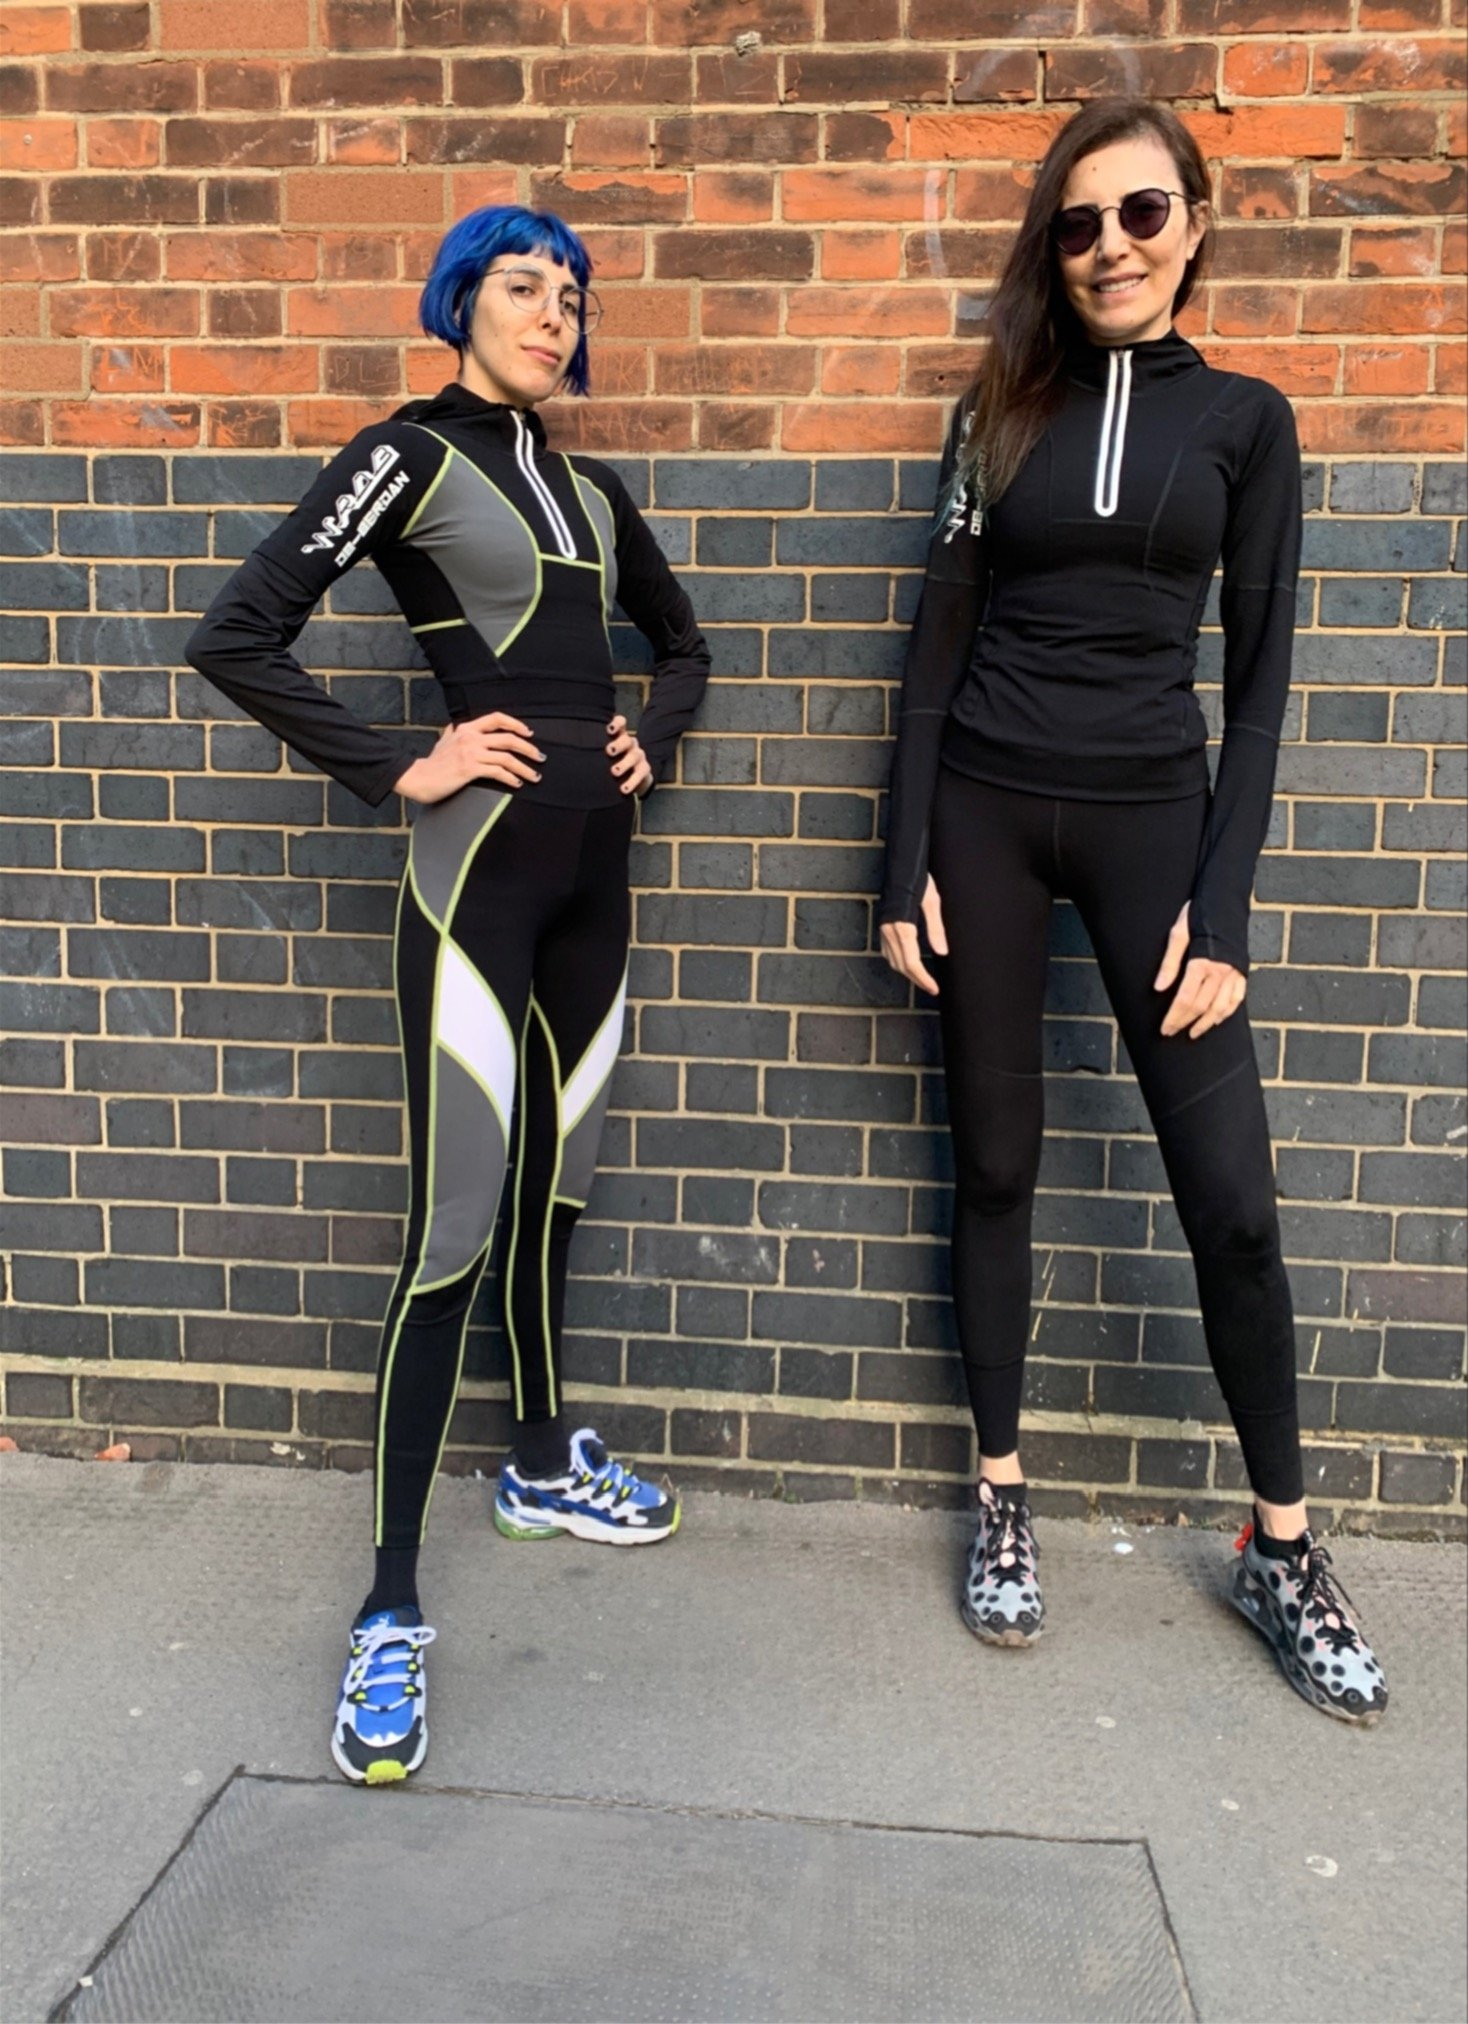 Designers Begüm Berdan (L) and her mother Deniz Berdan in London. (Photo courtesy of the Berdans)